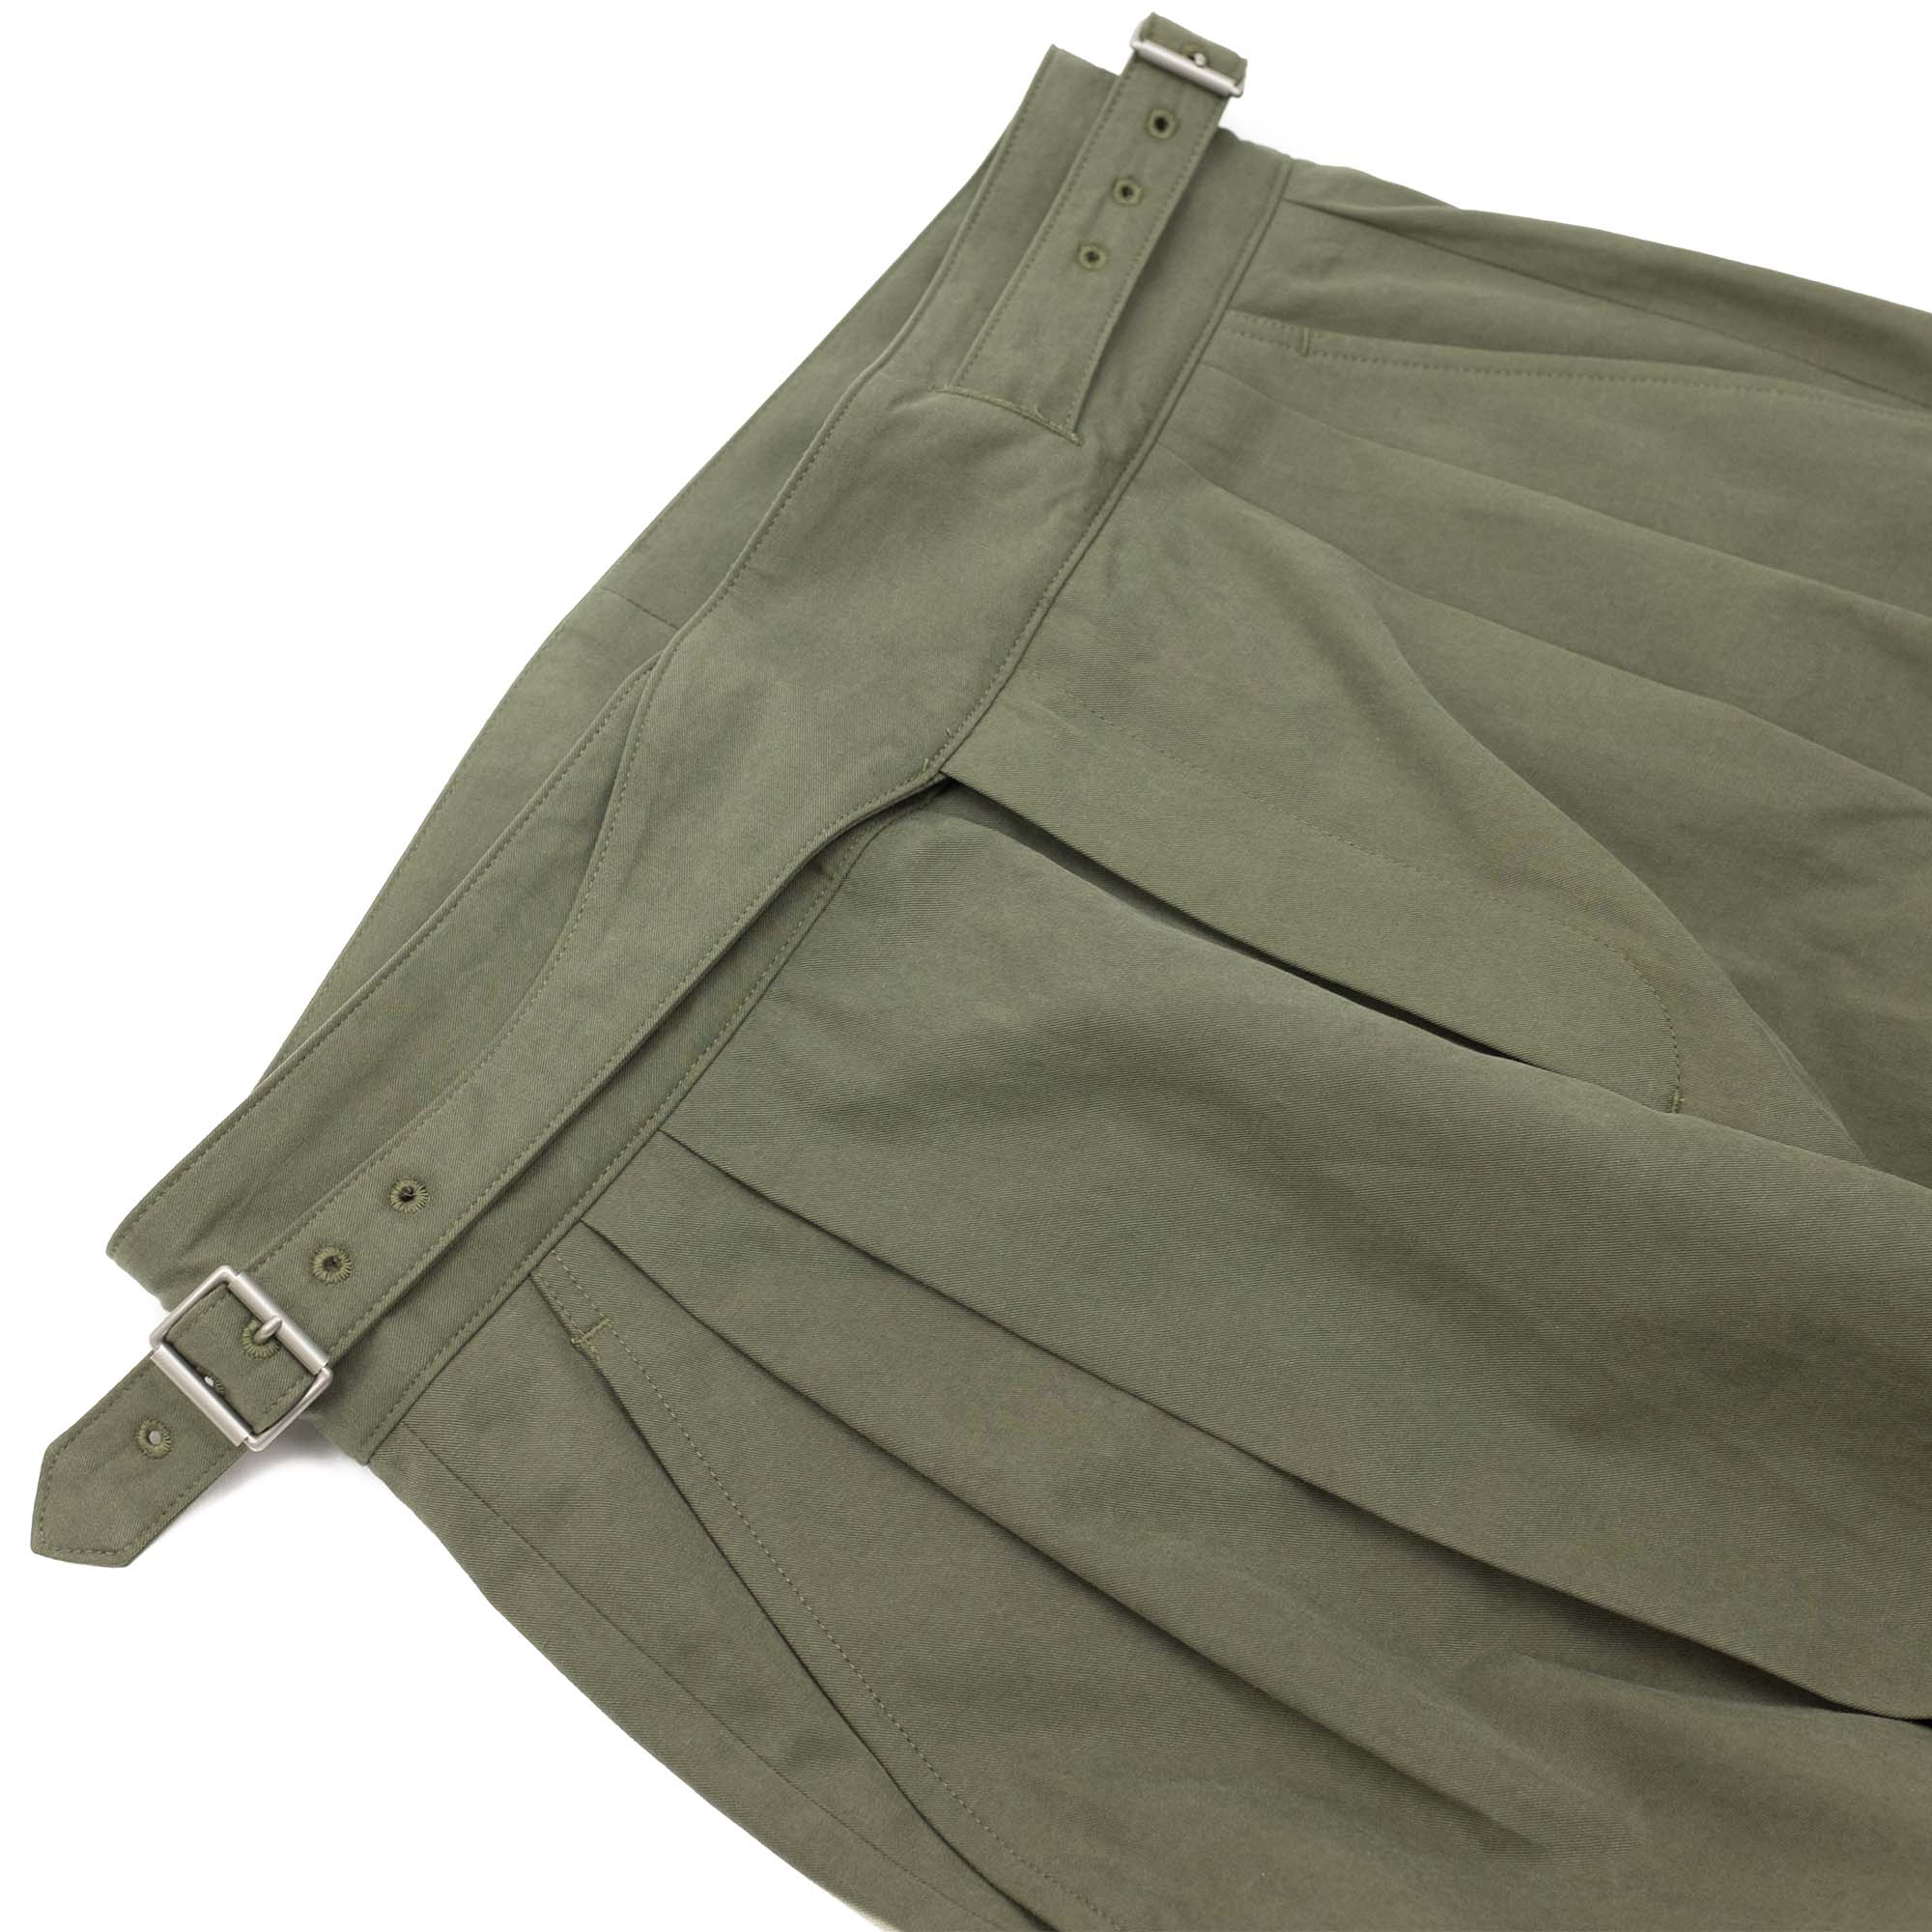 Sulfur Dyed NIDOM Gurkha Pants Khaki 5